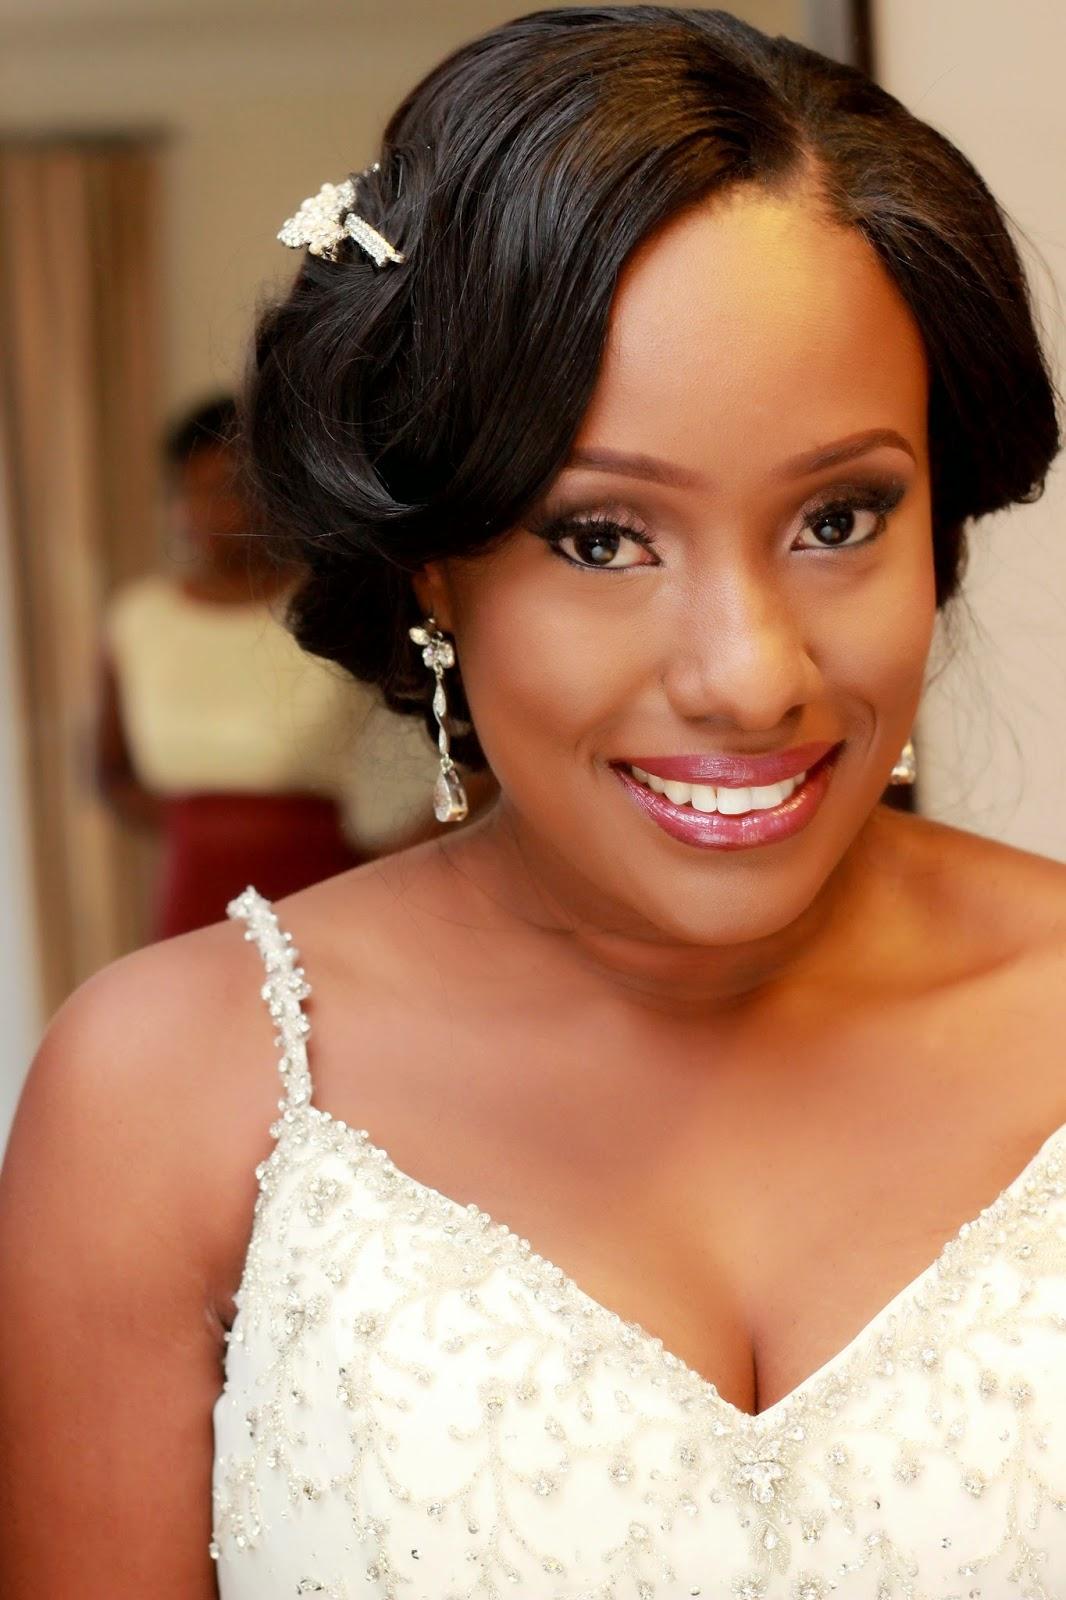 M.A.C.K BEAUTY AND FASHION: 10 white wedding bridal makeup ideas.